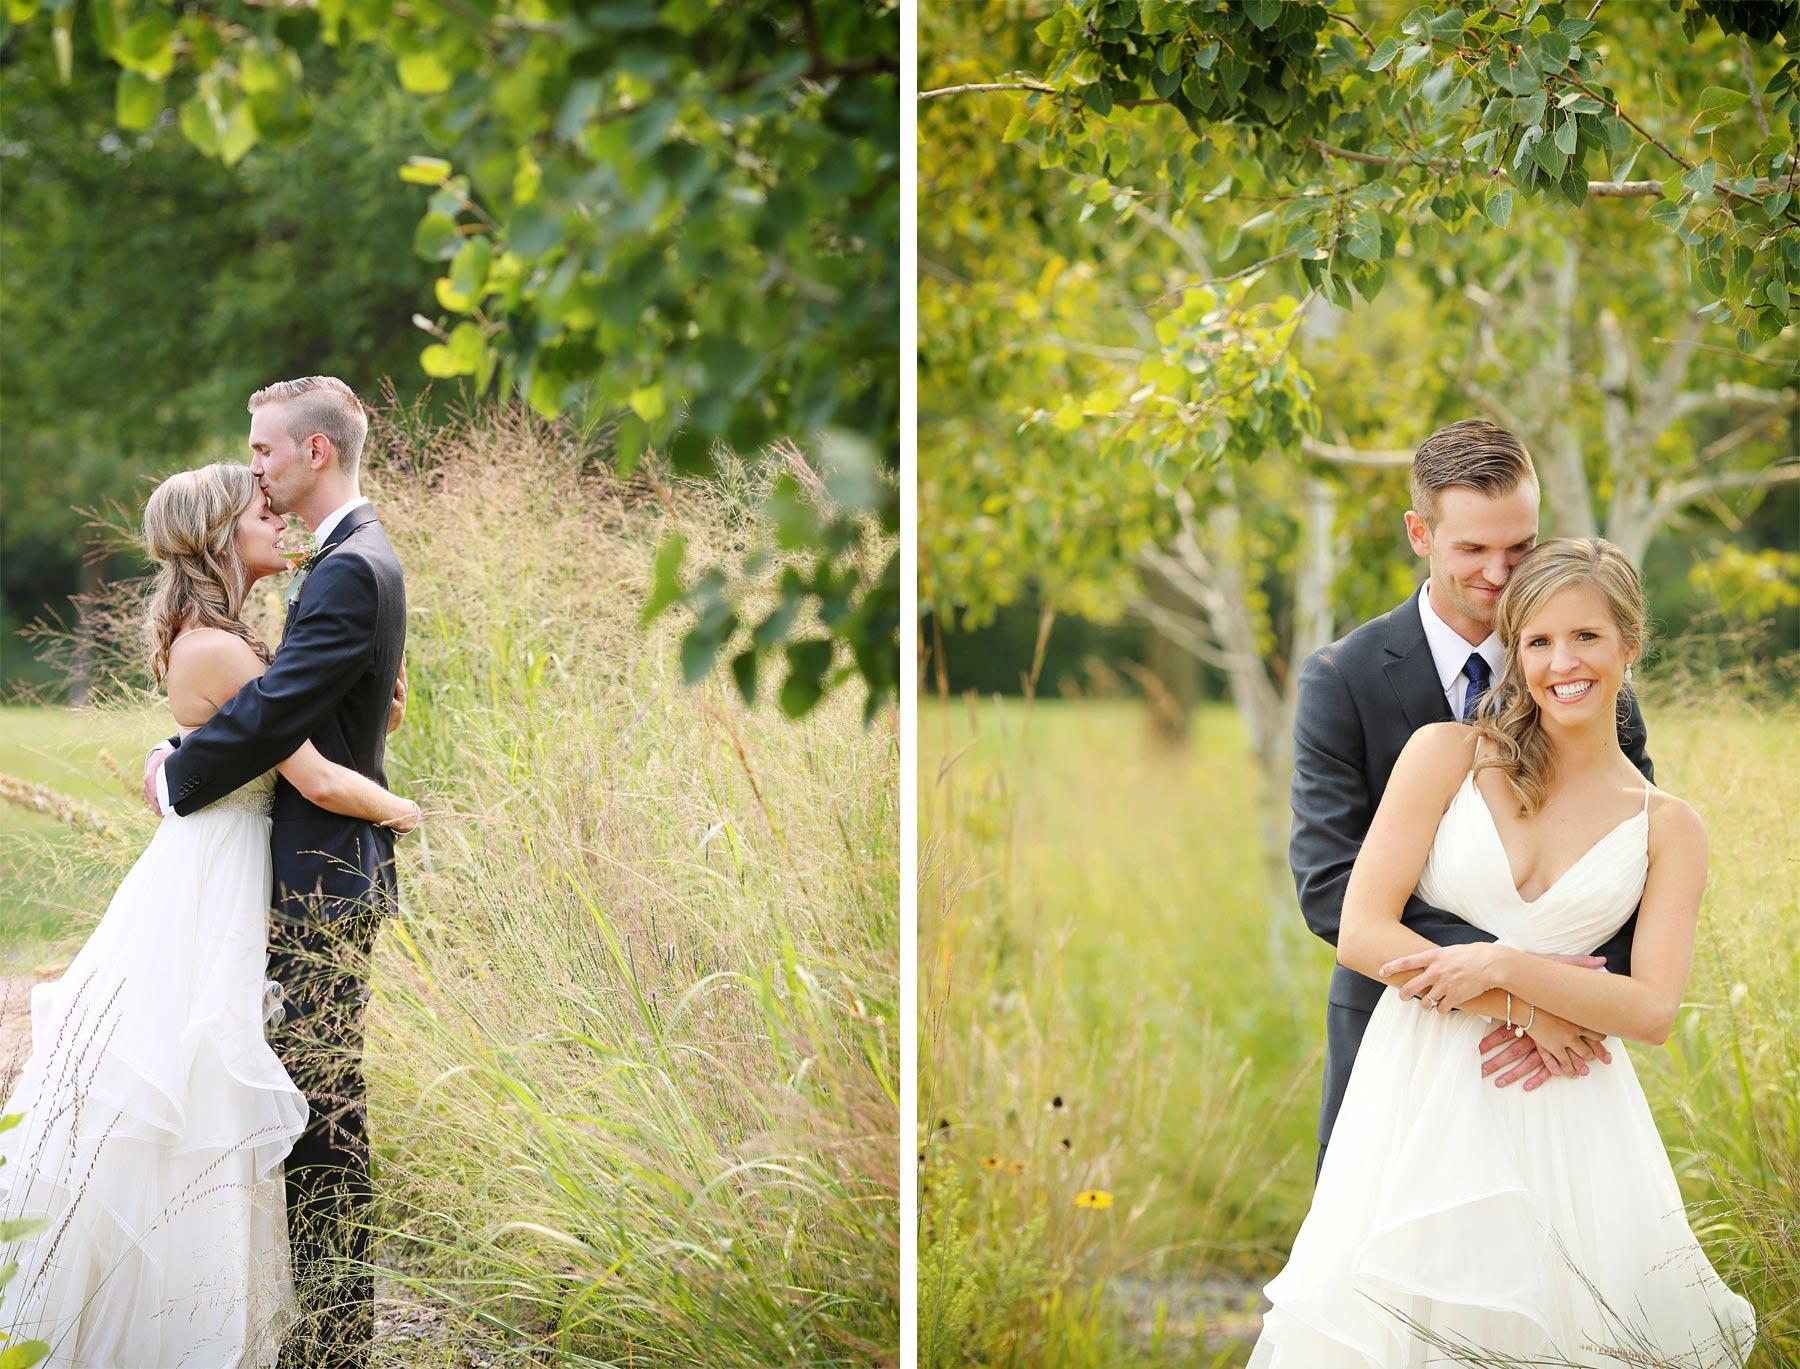 05-Minneapolis-Minnesota-Wedding-Photography-by-Vick-Photography-Field-First-Look-Jess-&-Jake.jpg